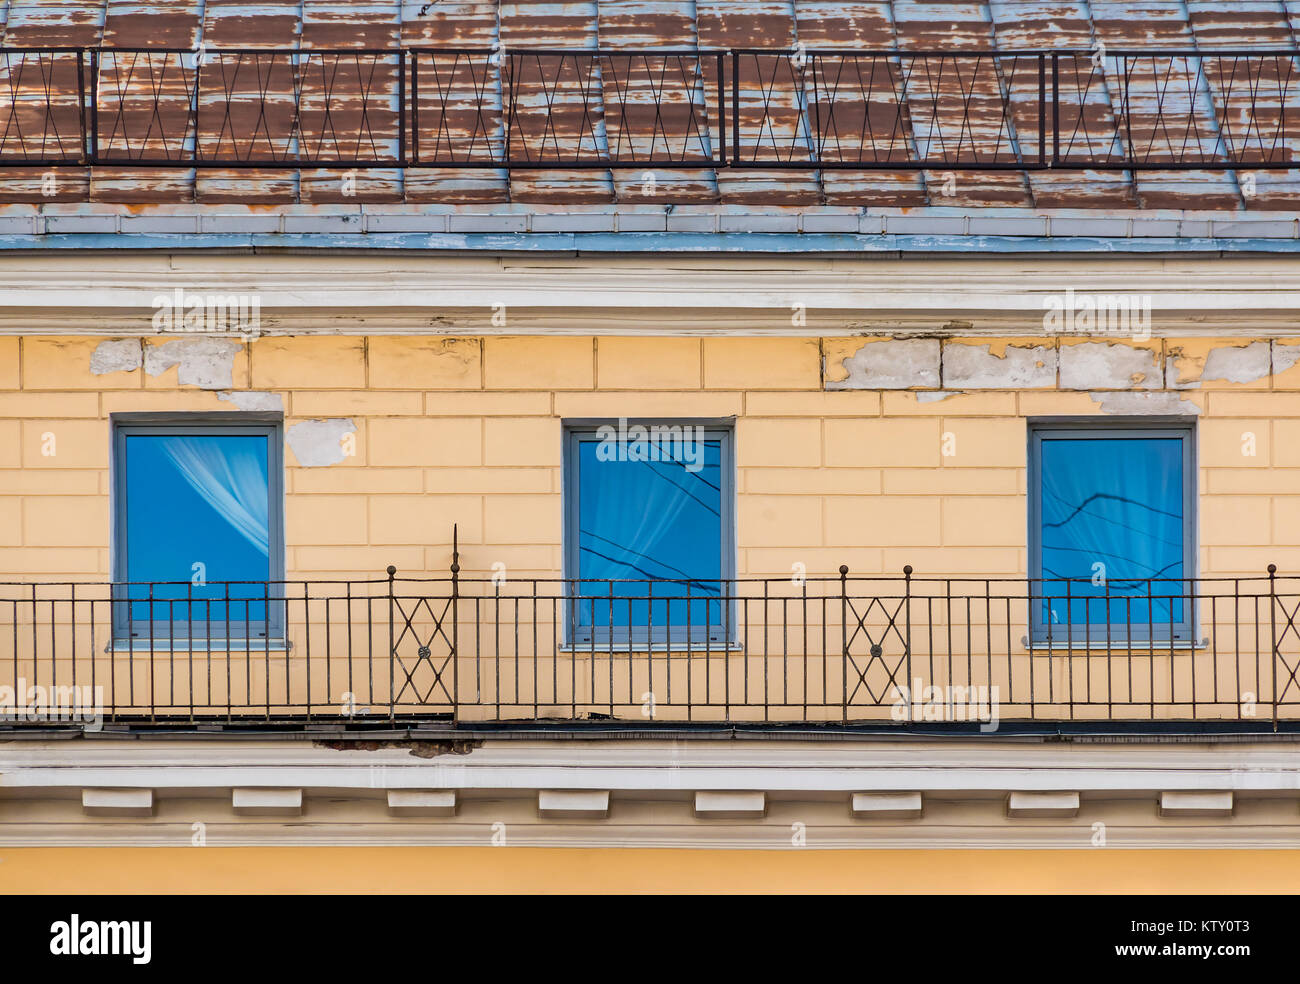 antique roof window attic stockfotos antique roof window attic bilder alamy. Black Bedroom Furniture Sets. Home Design Ideas